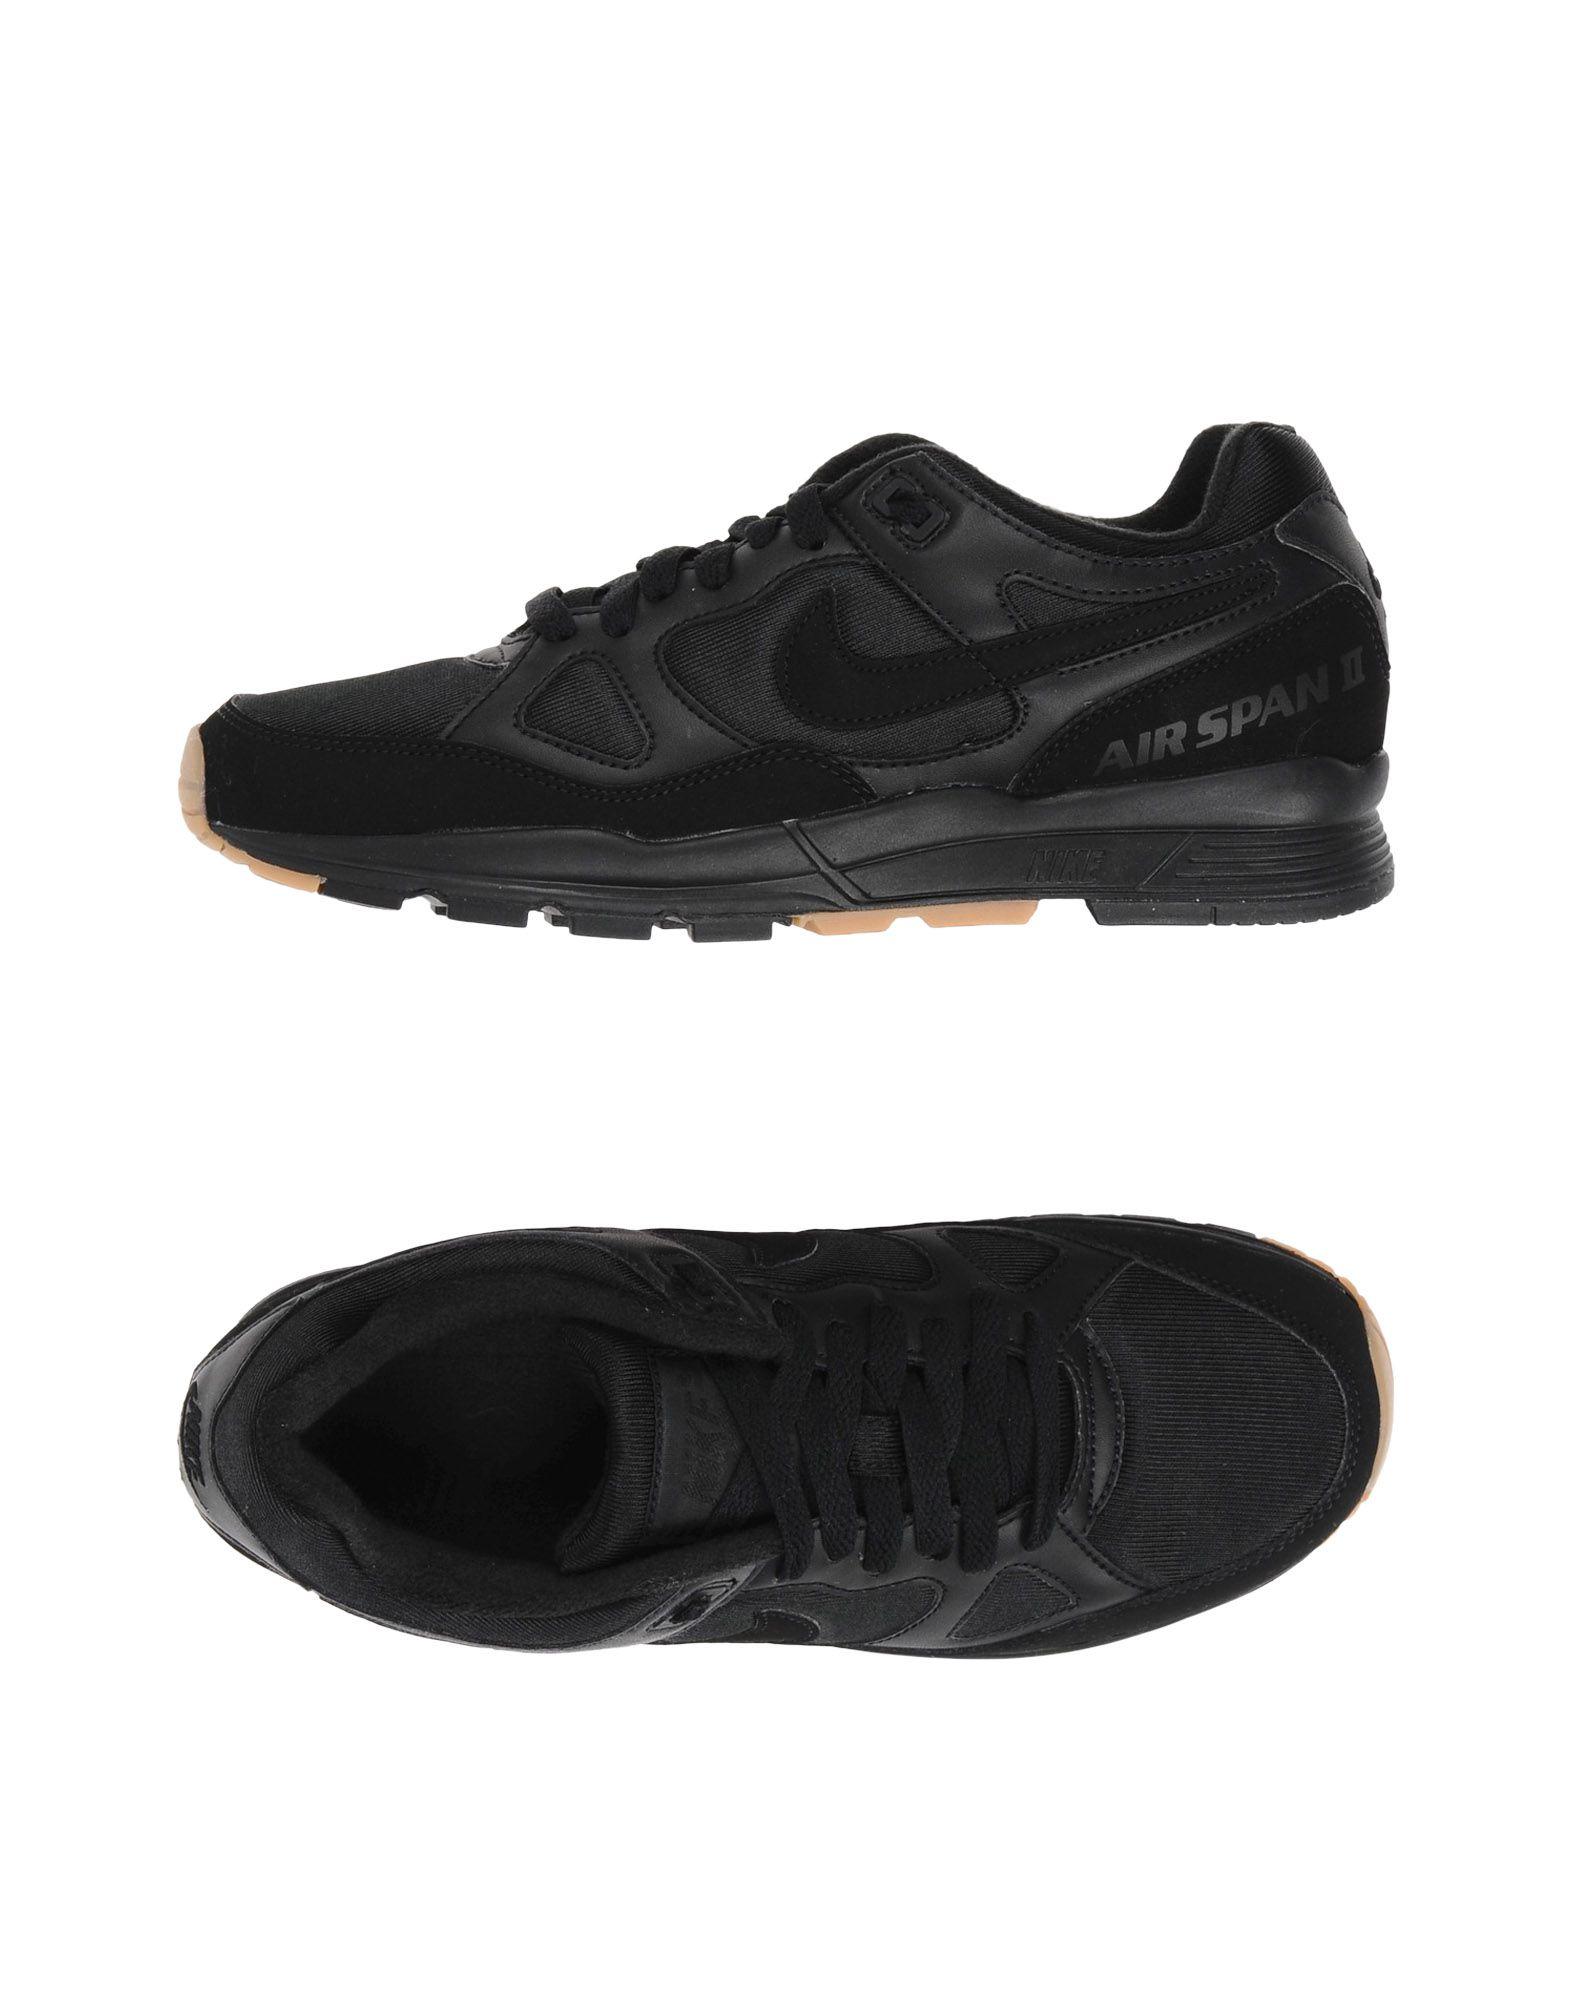 Nike Air Span Ii  11452648NP Gute Qualität beliebte Schuhe